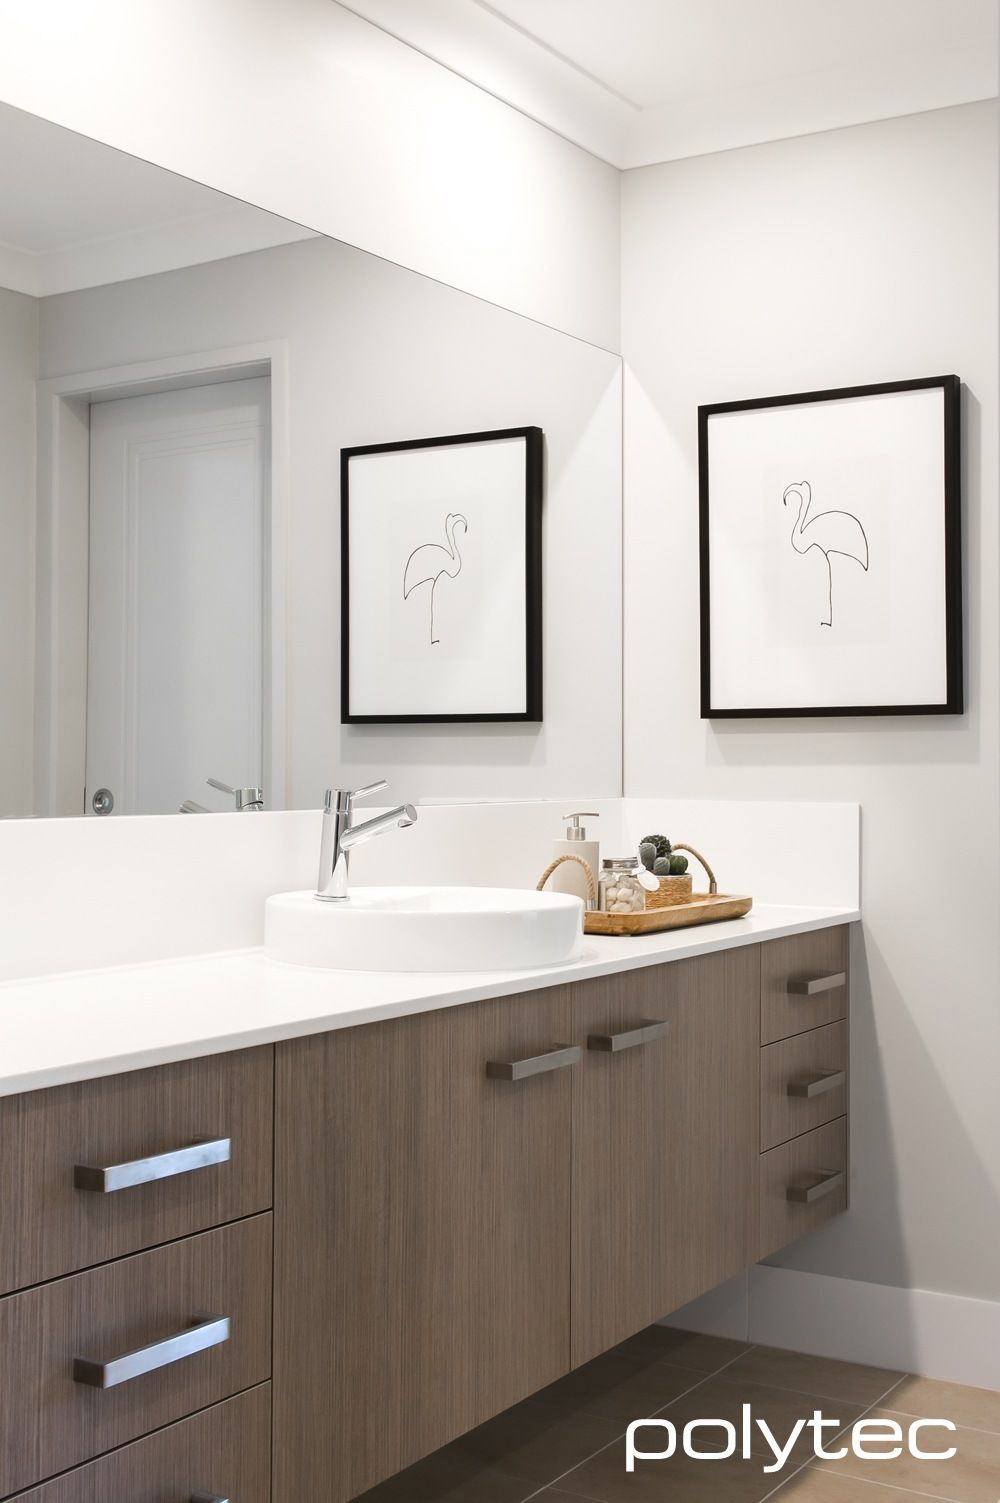 polytec vanity in ravine cafe oak modern bathroom design stylish bathroom vanity in melamine tessuto milan matt